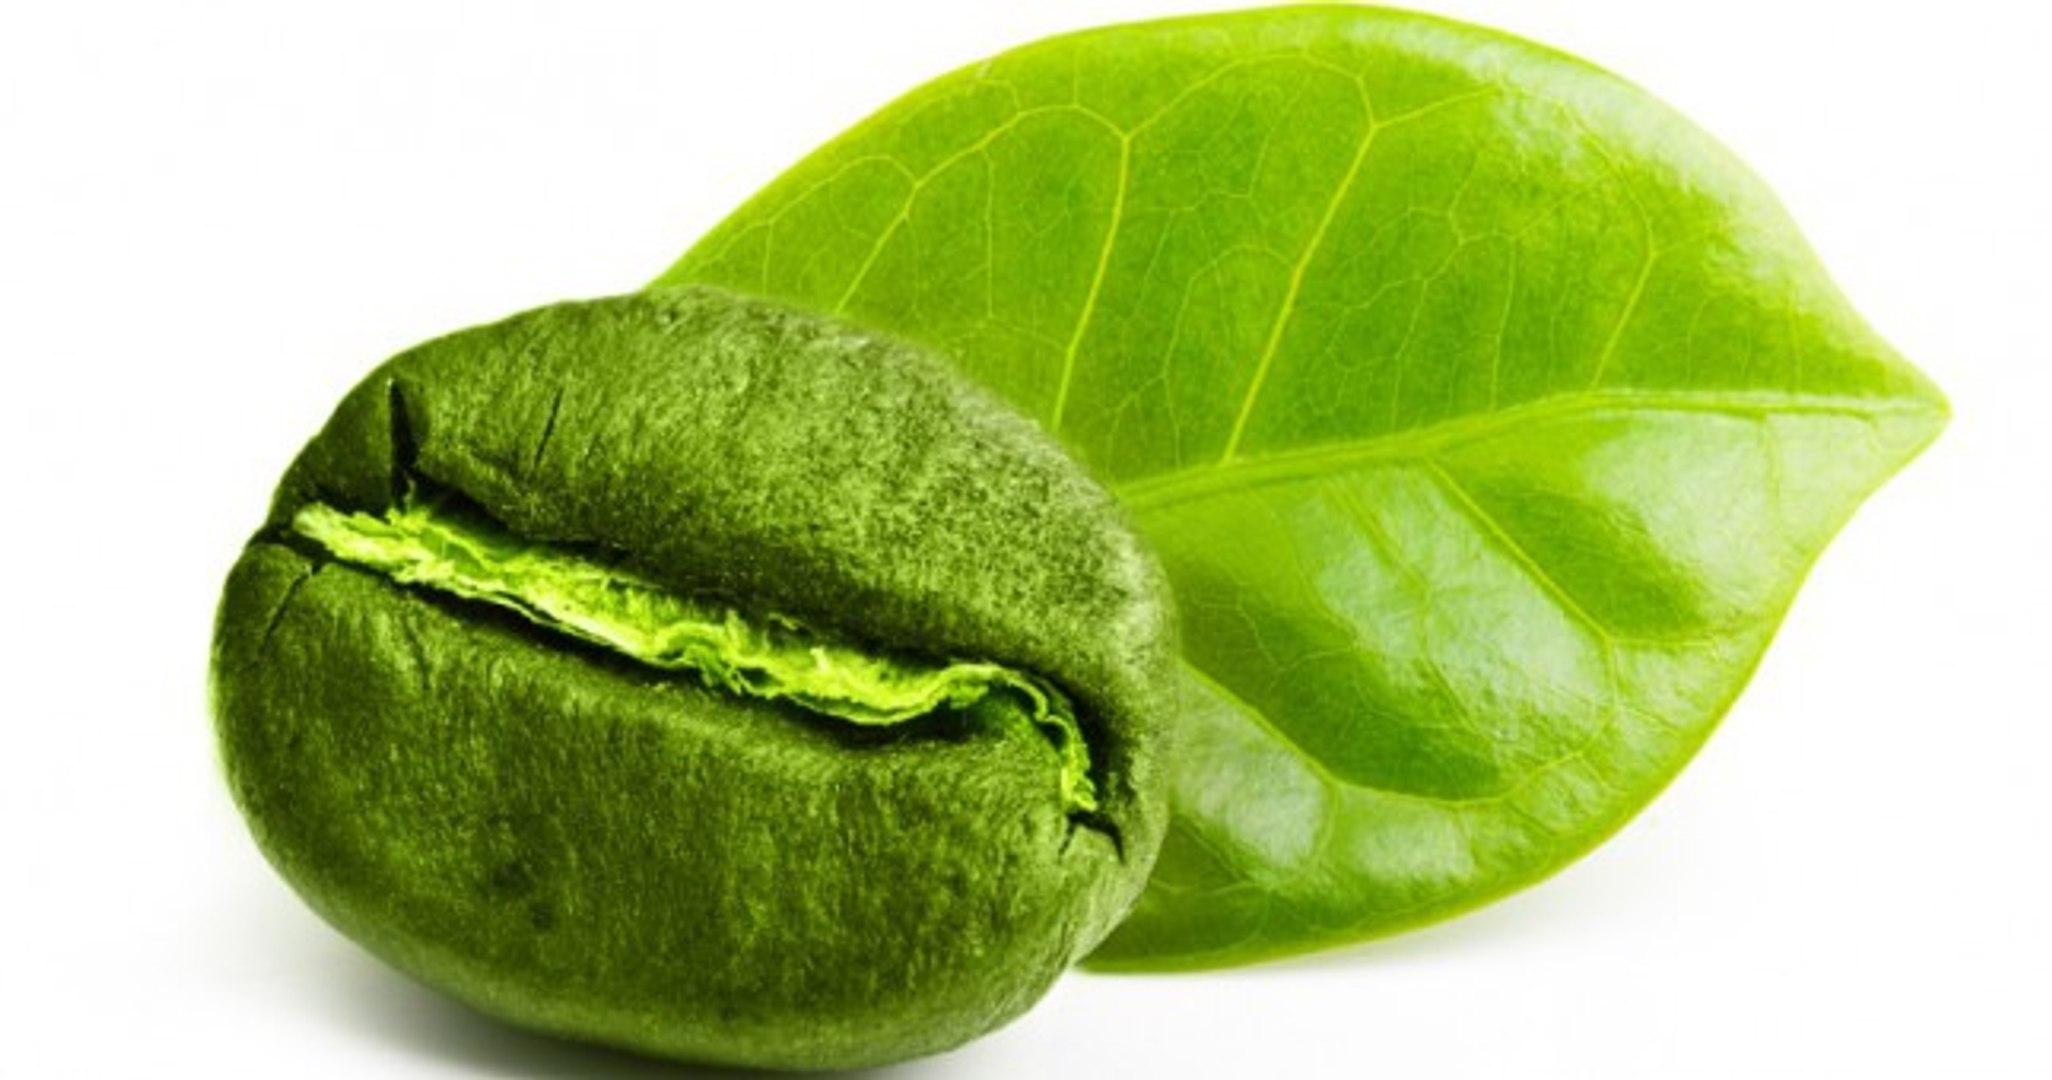 Yeşil kahvenin inanılmaz faydaları